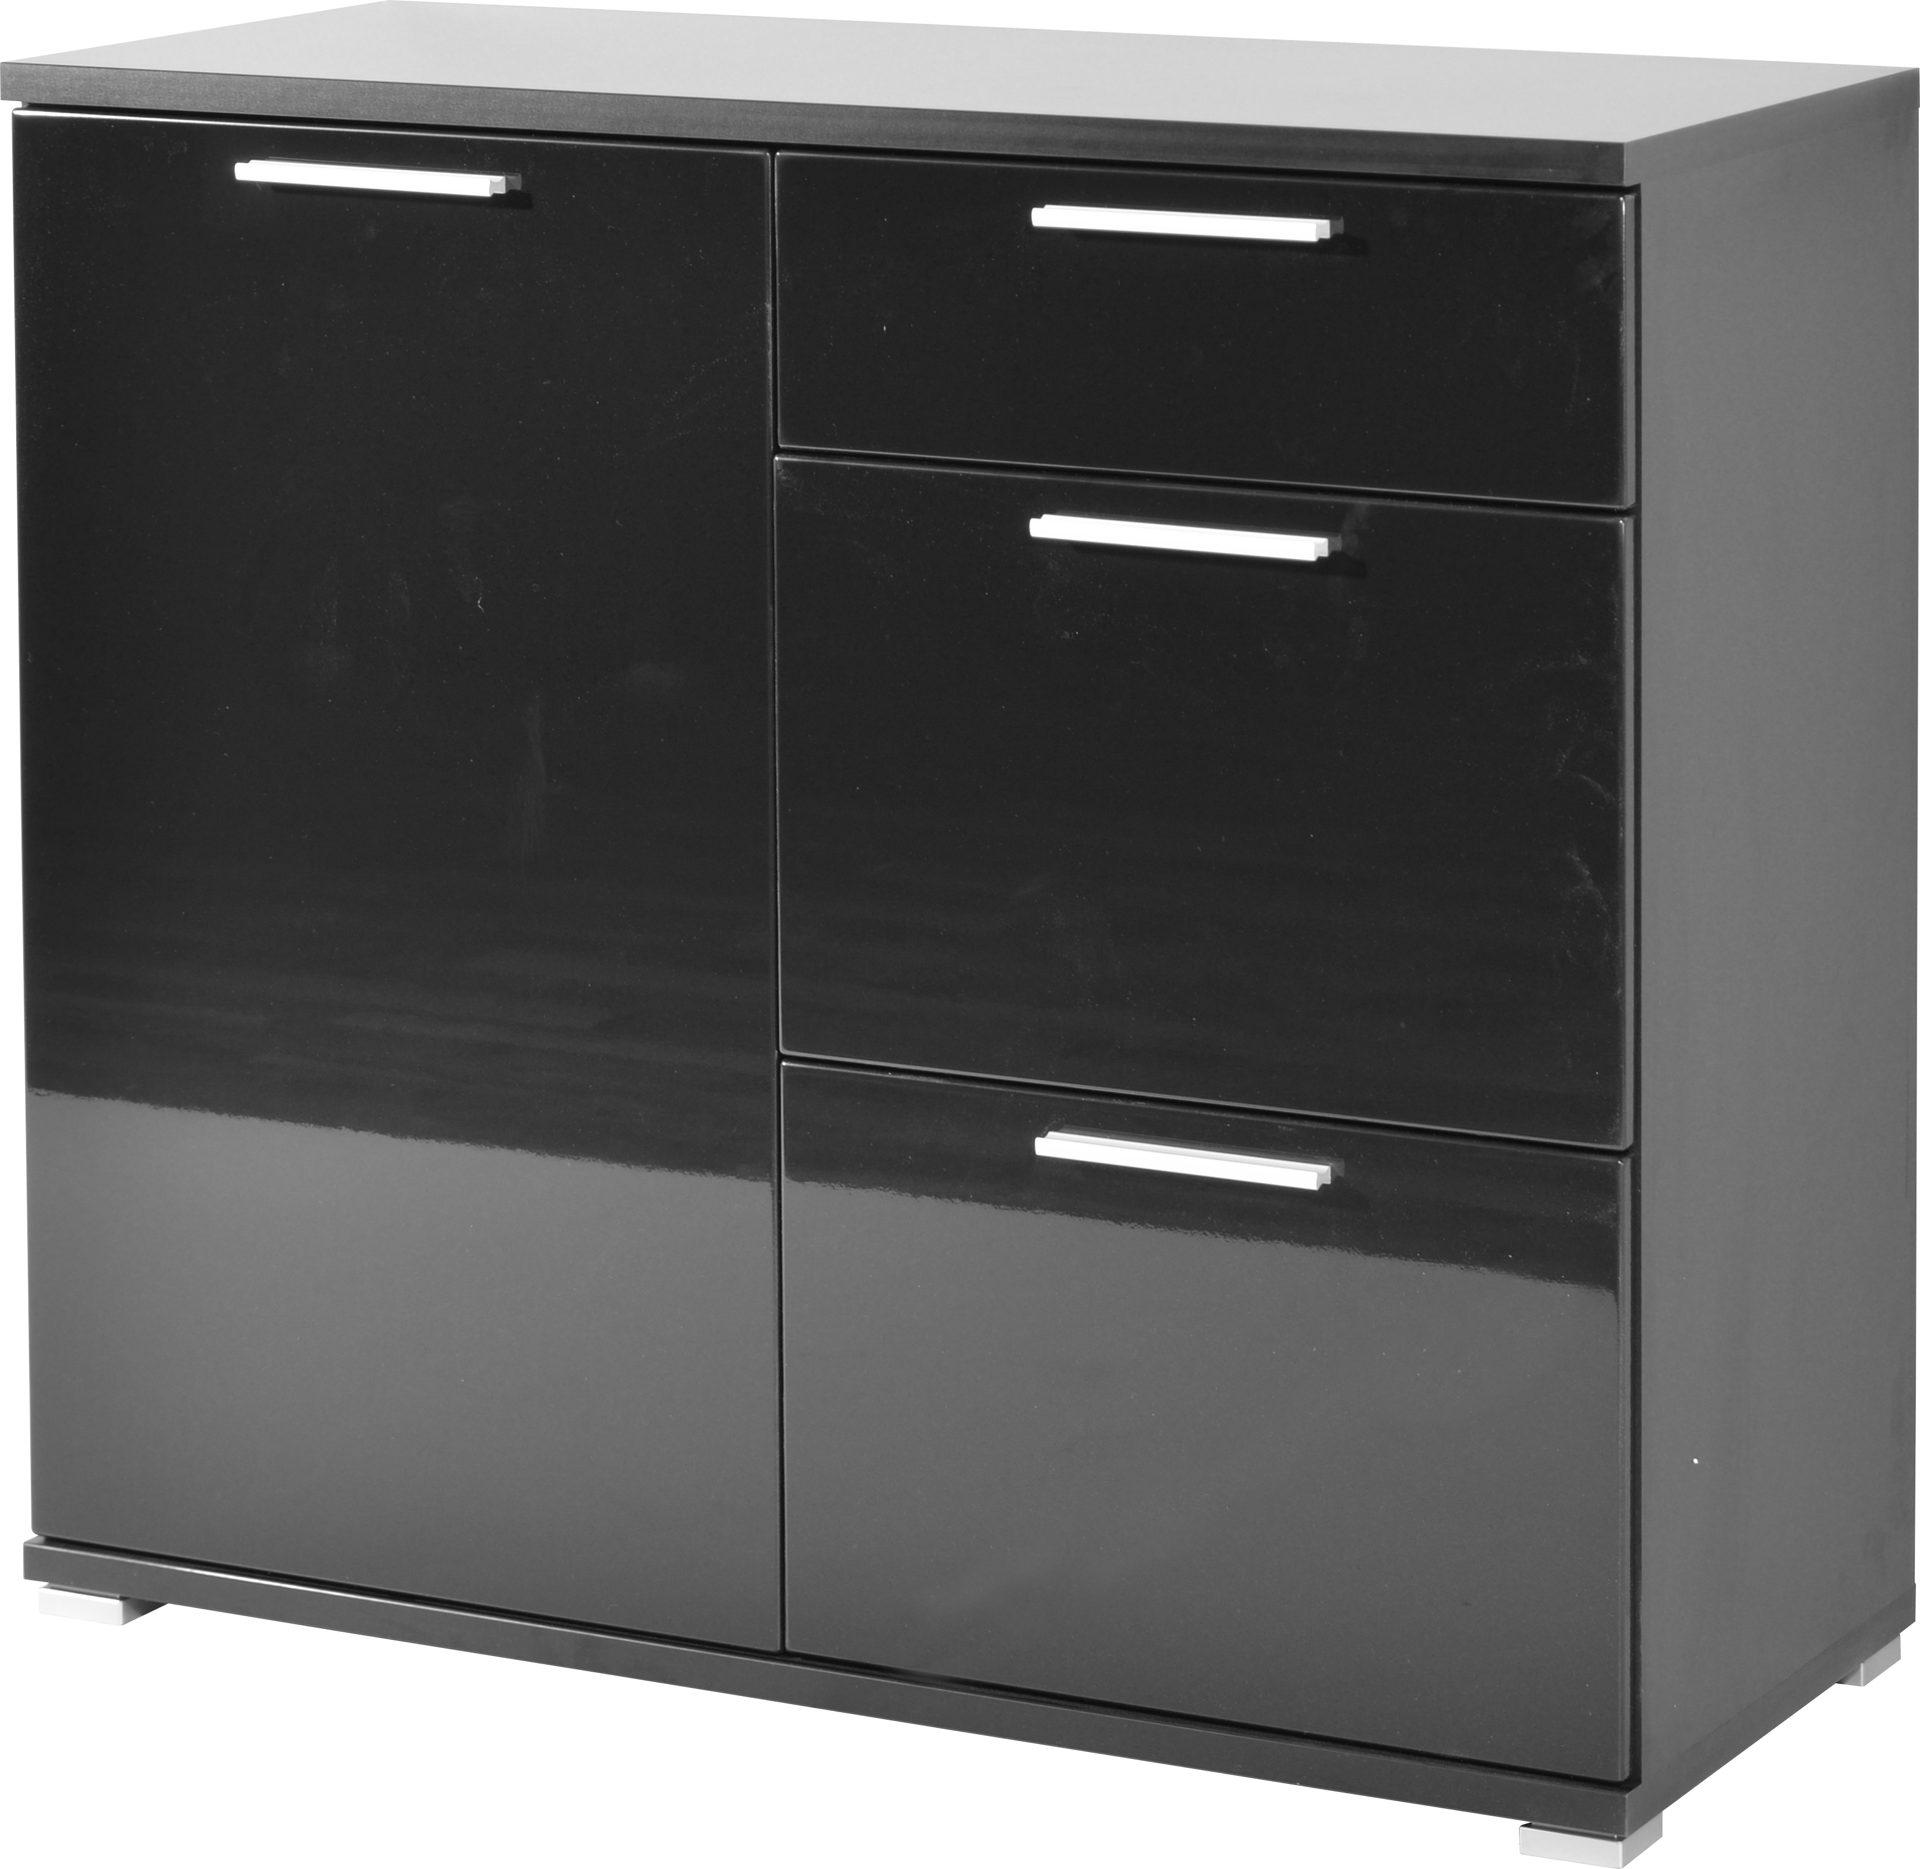 Kommode Almeria Als Stilvolles Sideboard Schwarze Kunststoff